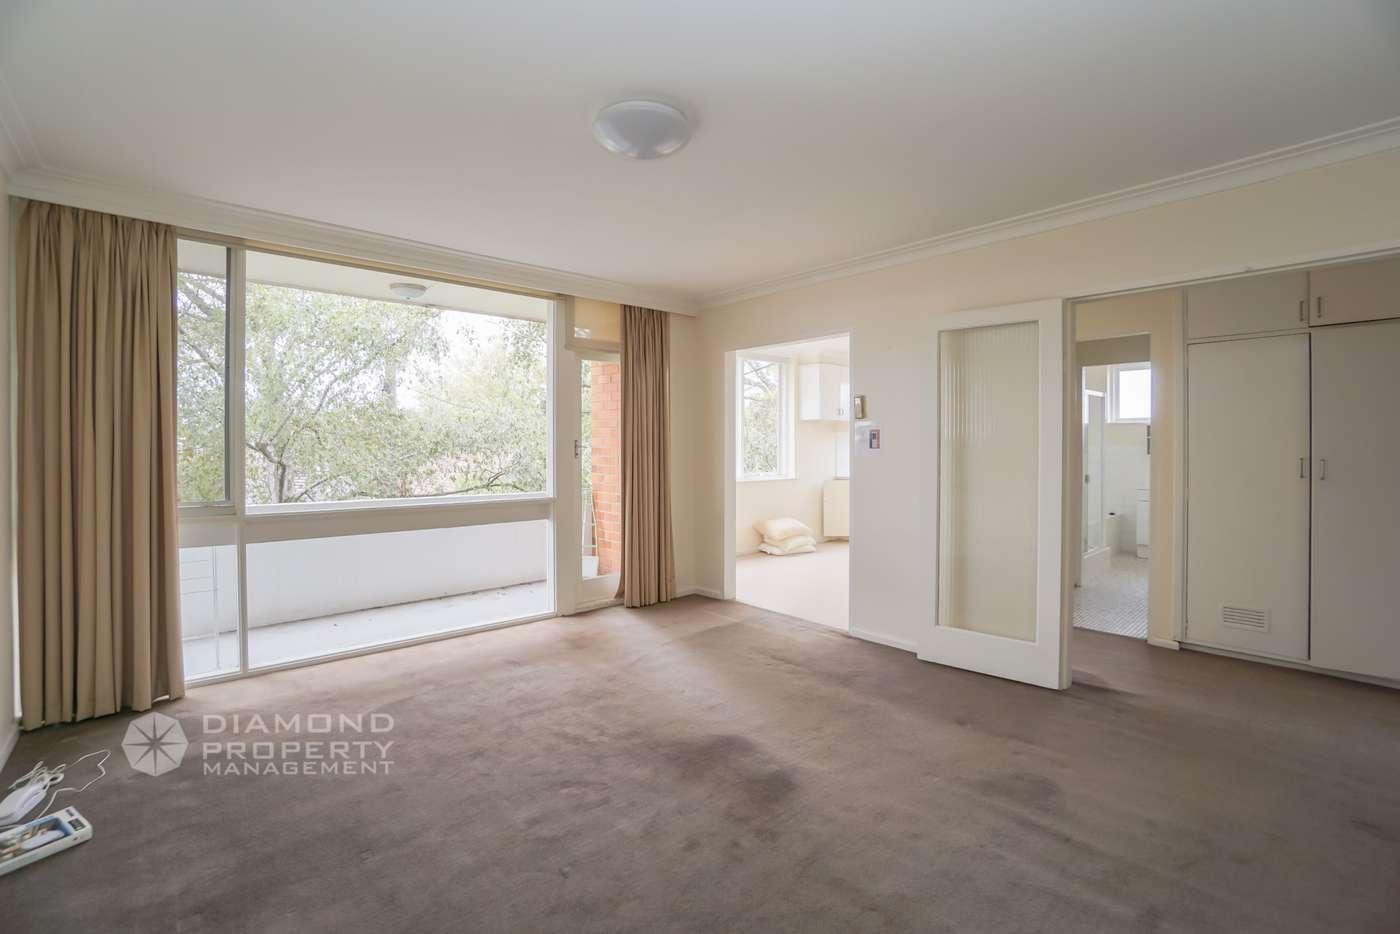 Main view of Homely apartment listing, 4/147 Tooronga Road, Glen Iris VIC 3146